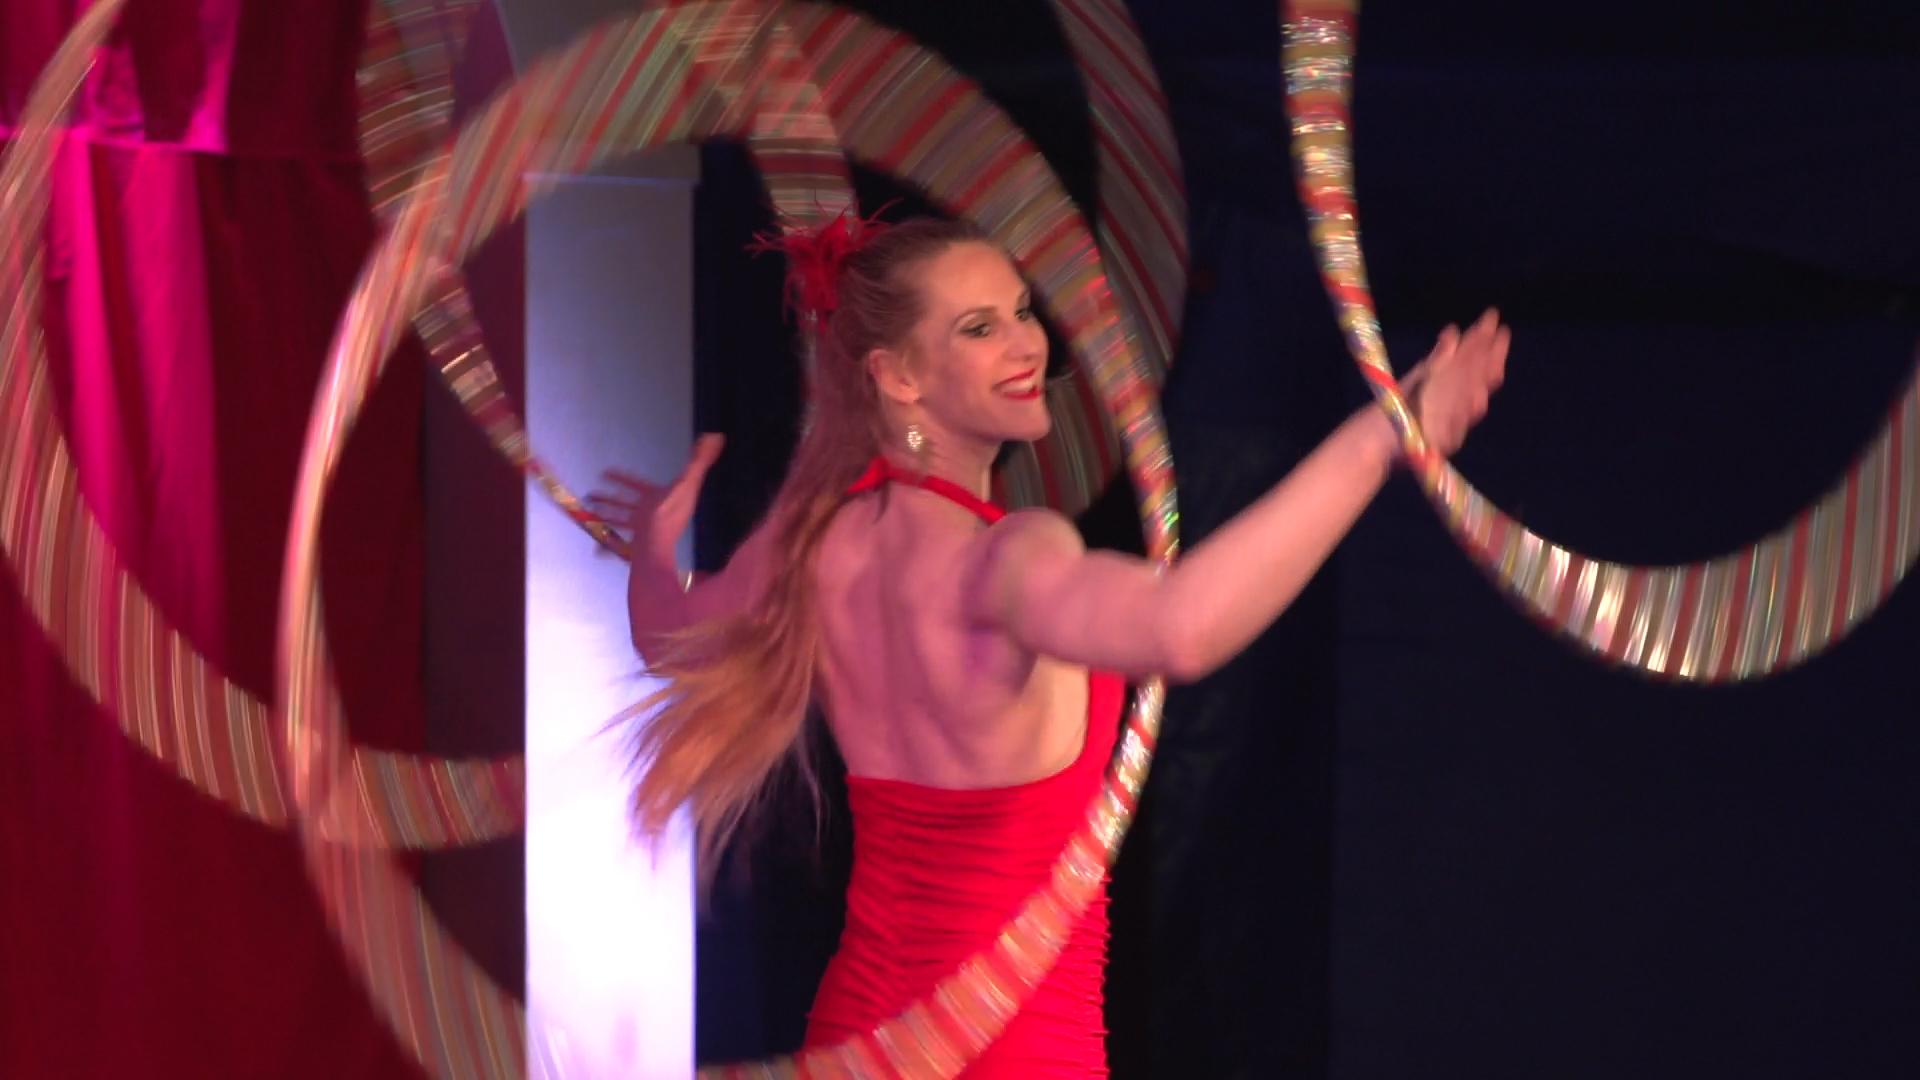 Laura-Cohen-Hula-Hoop-Show-circusevents-koeln-1